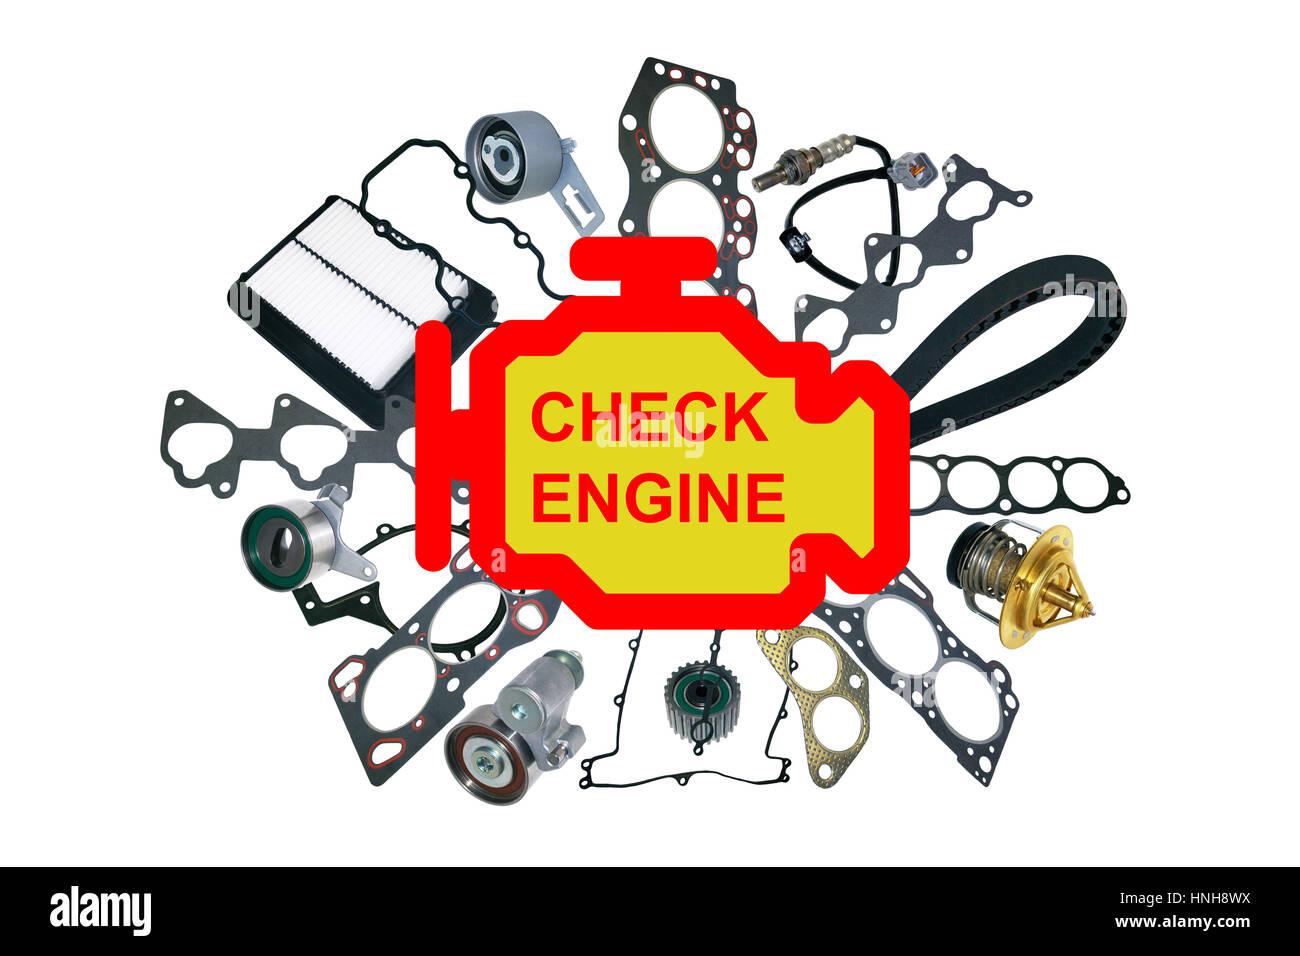 Check Engine Light Symbol